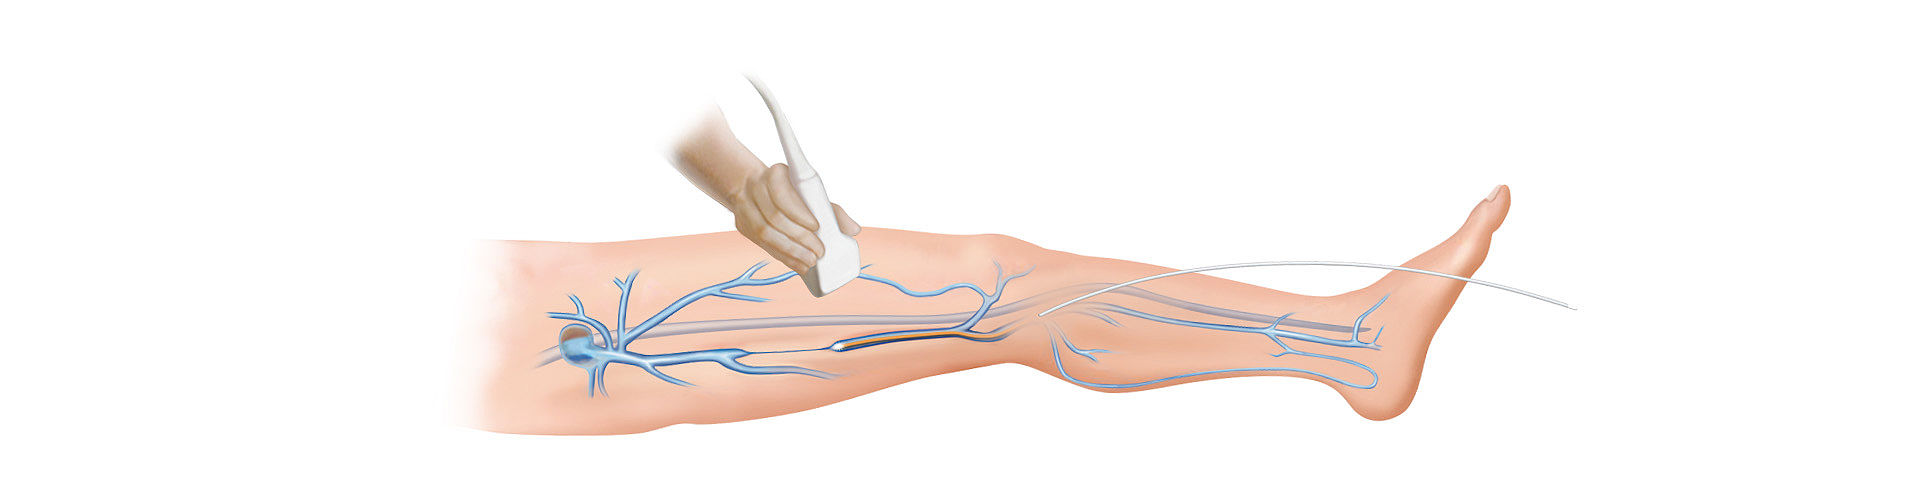 Surgical Laser Systems - diomax Venex 360 EVLO